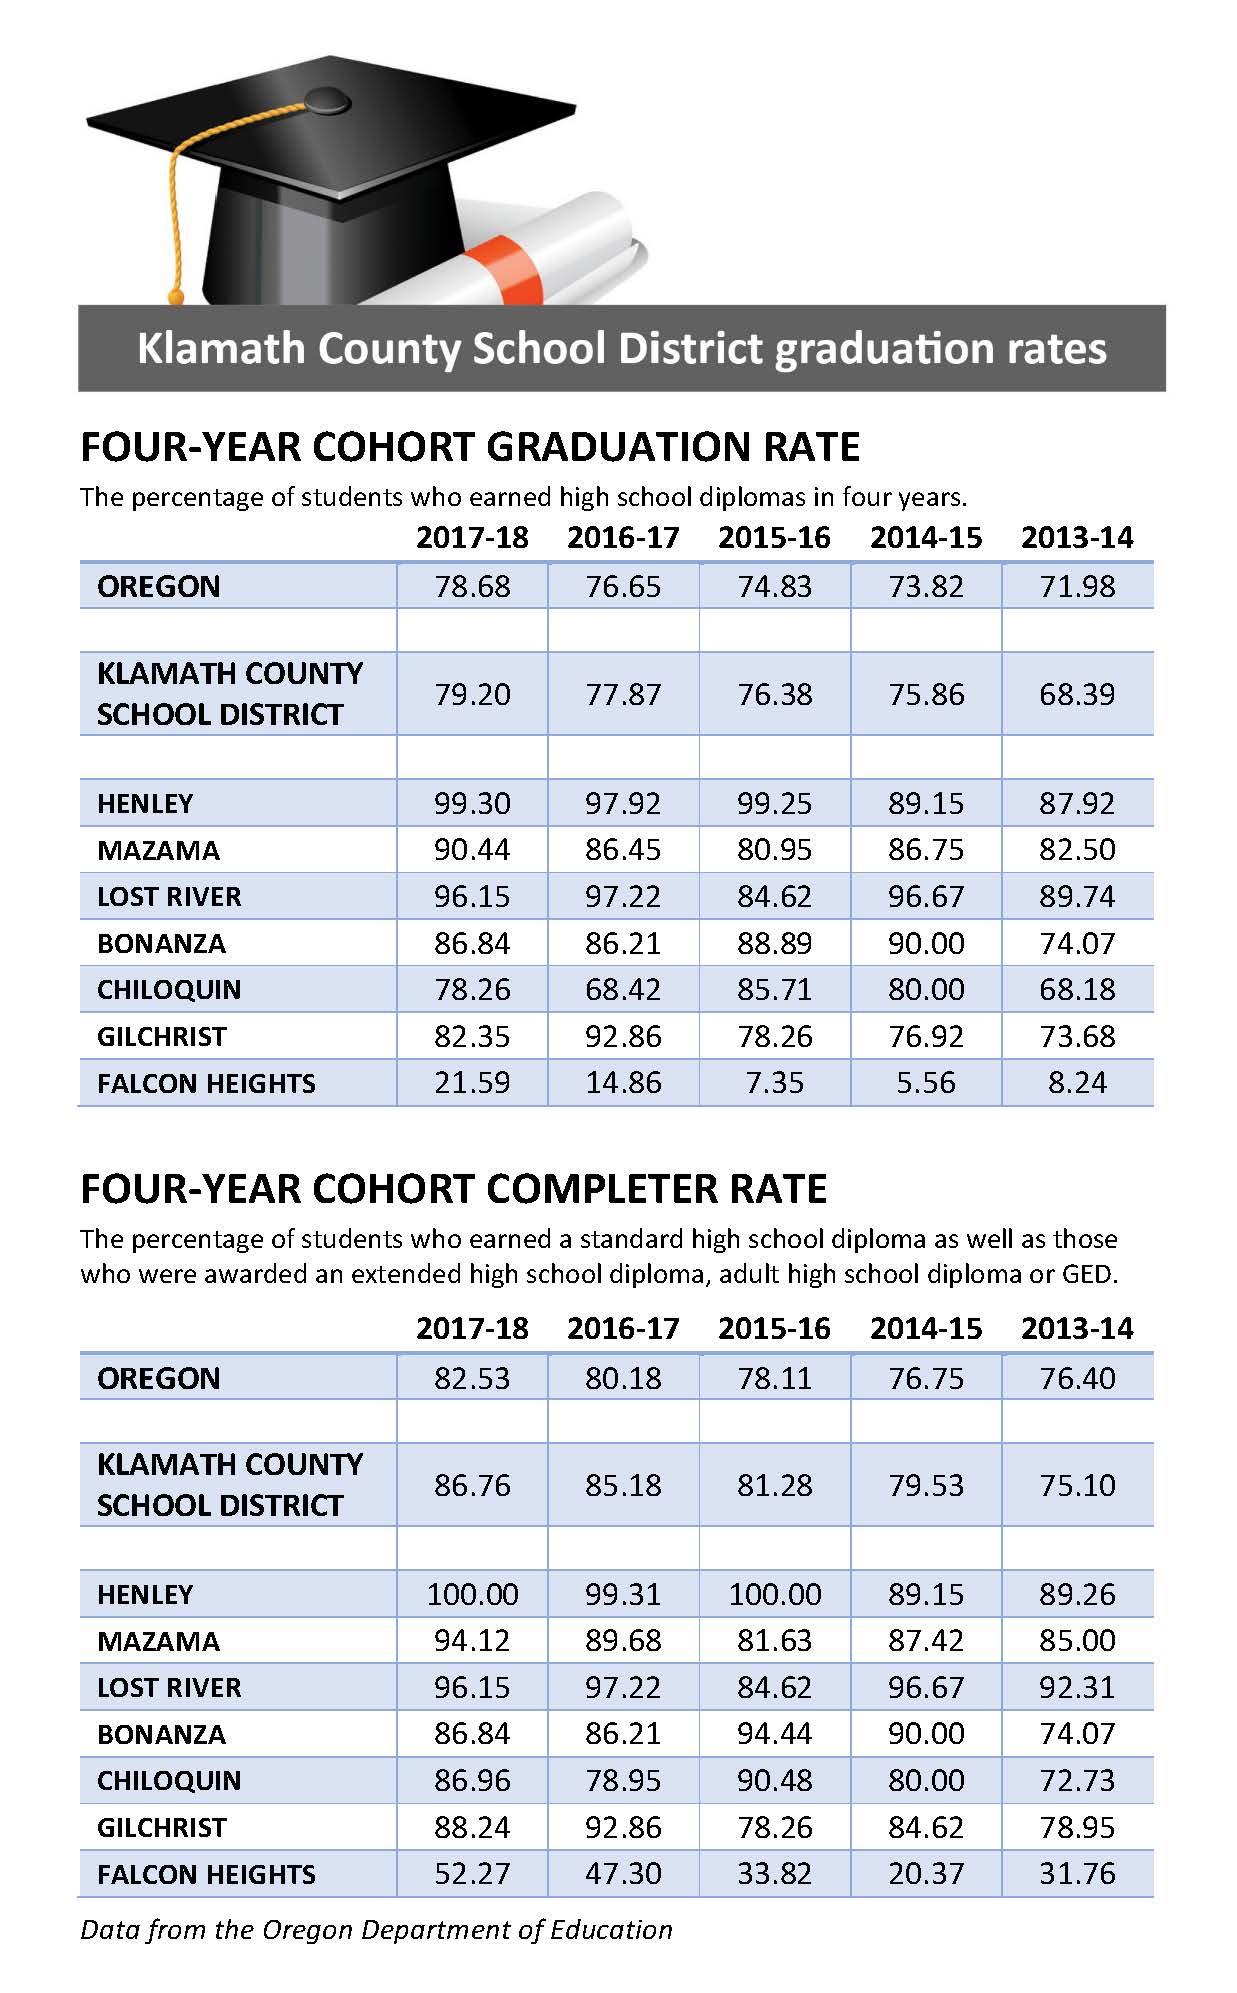 Klamath County School District Graduation Rates.  Click for larger